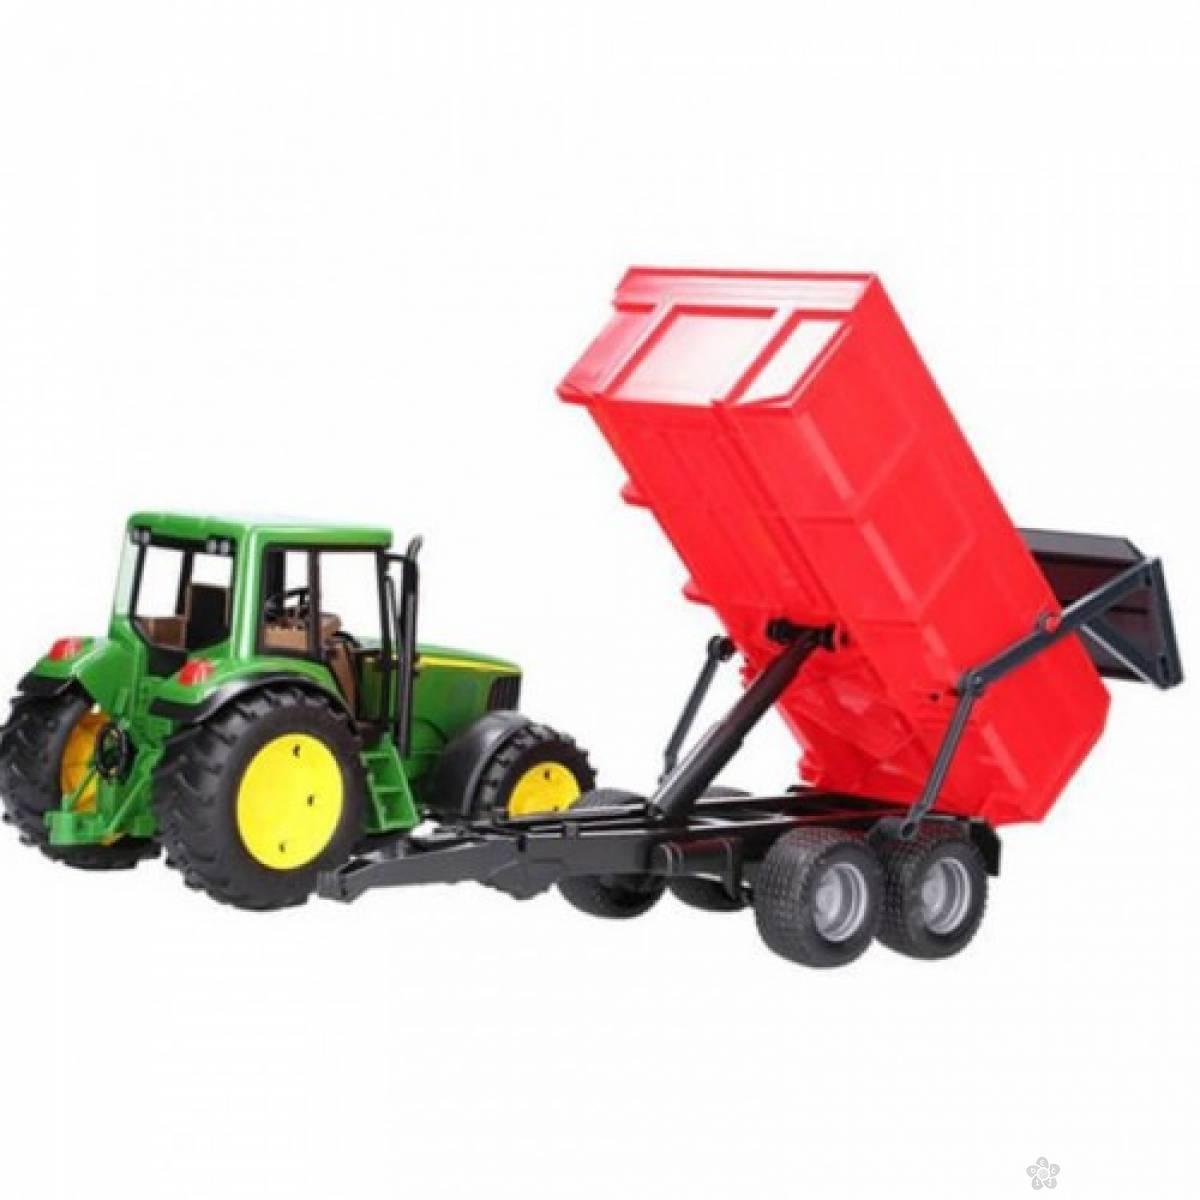 Traktor John Deere sa prikolicom i prednjim utovarivačem 011277